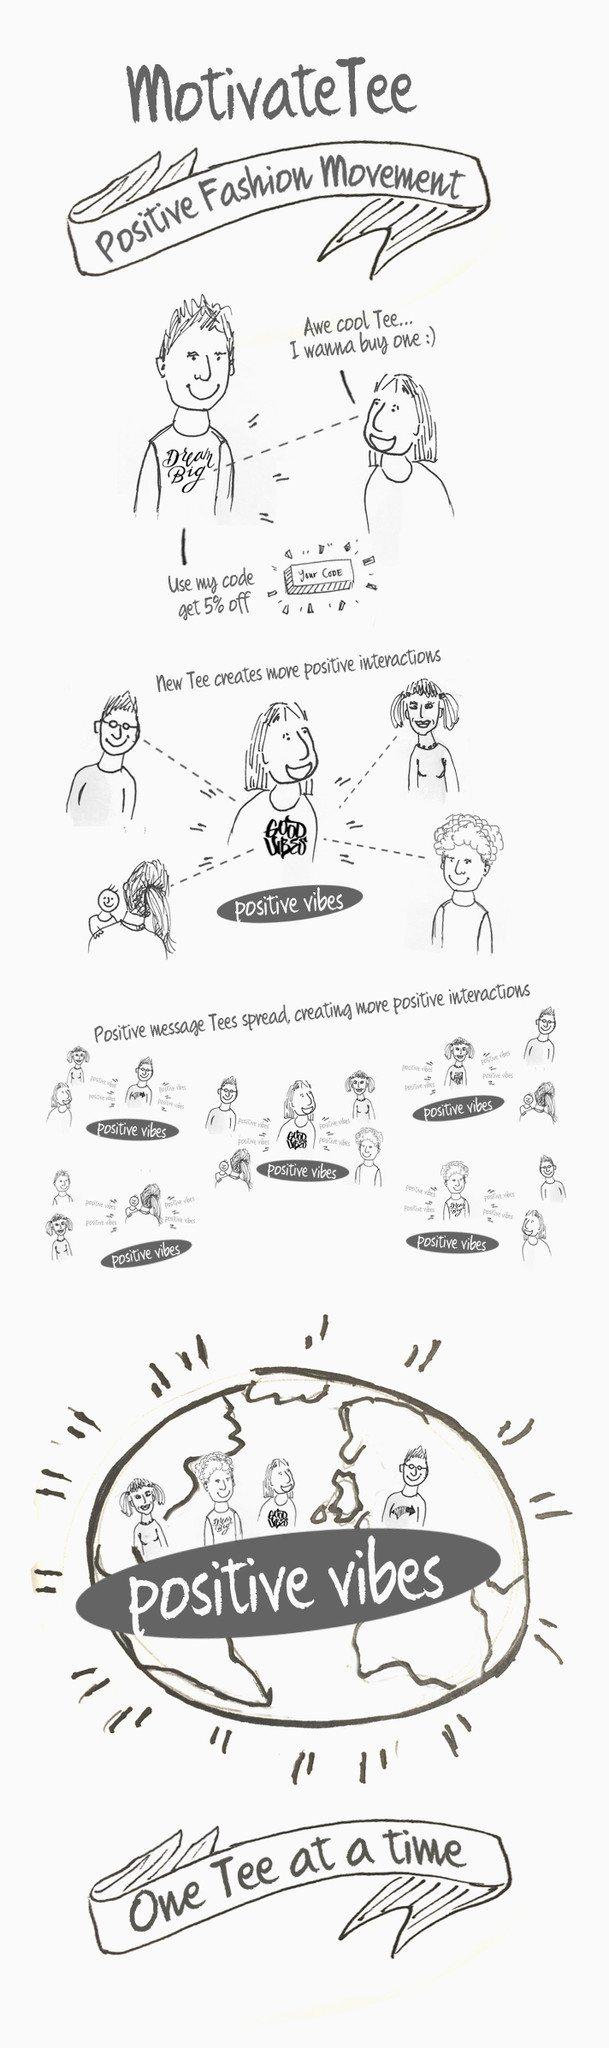 The-movement-illustration_5d2223a8-9d89-41f5-bffd-2af2462b7f69_2048x2048